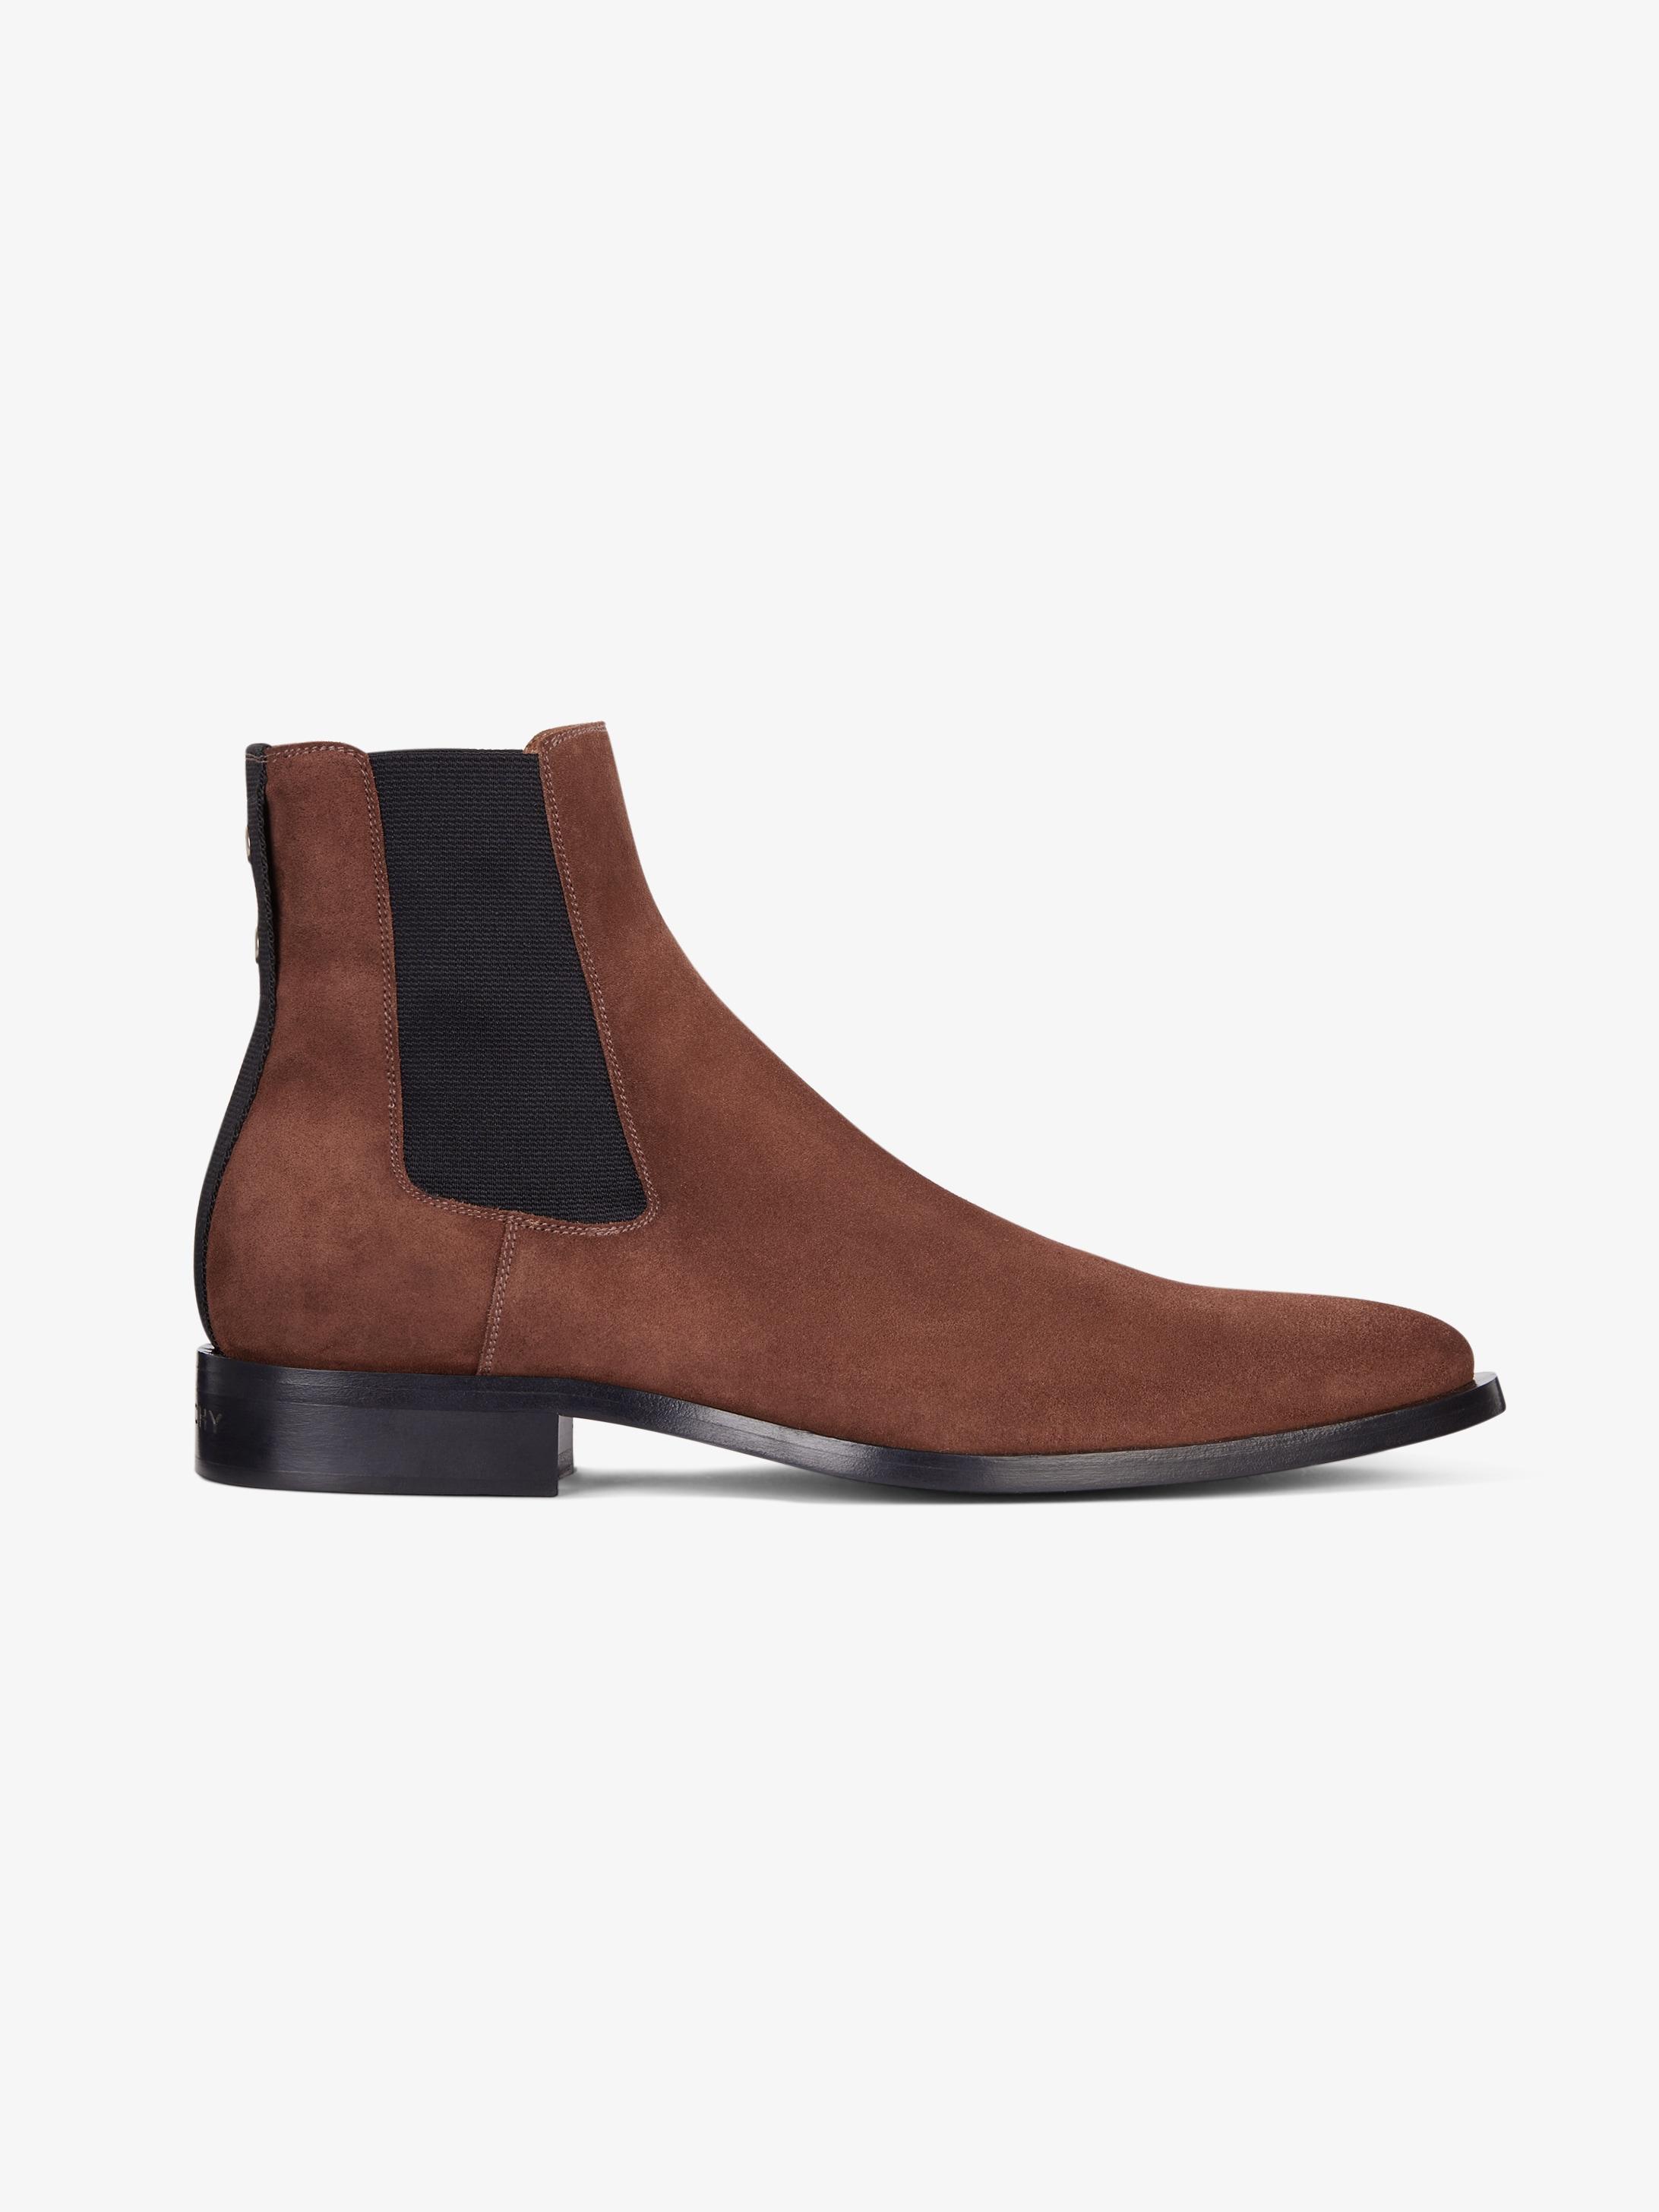 Dallas chelsea  boots in suede